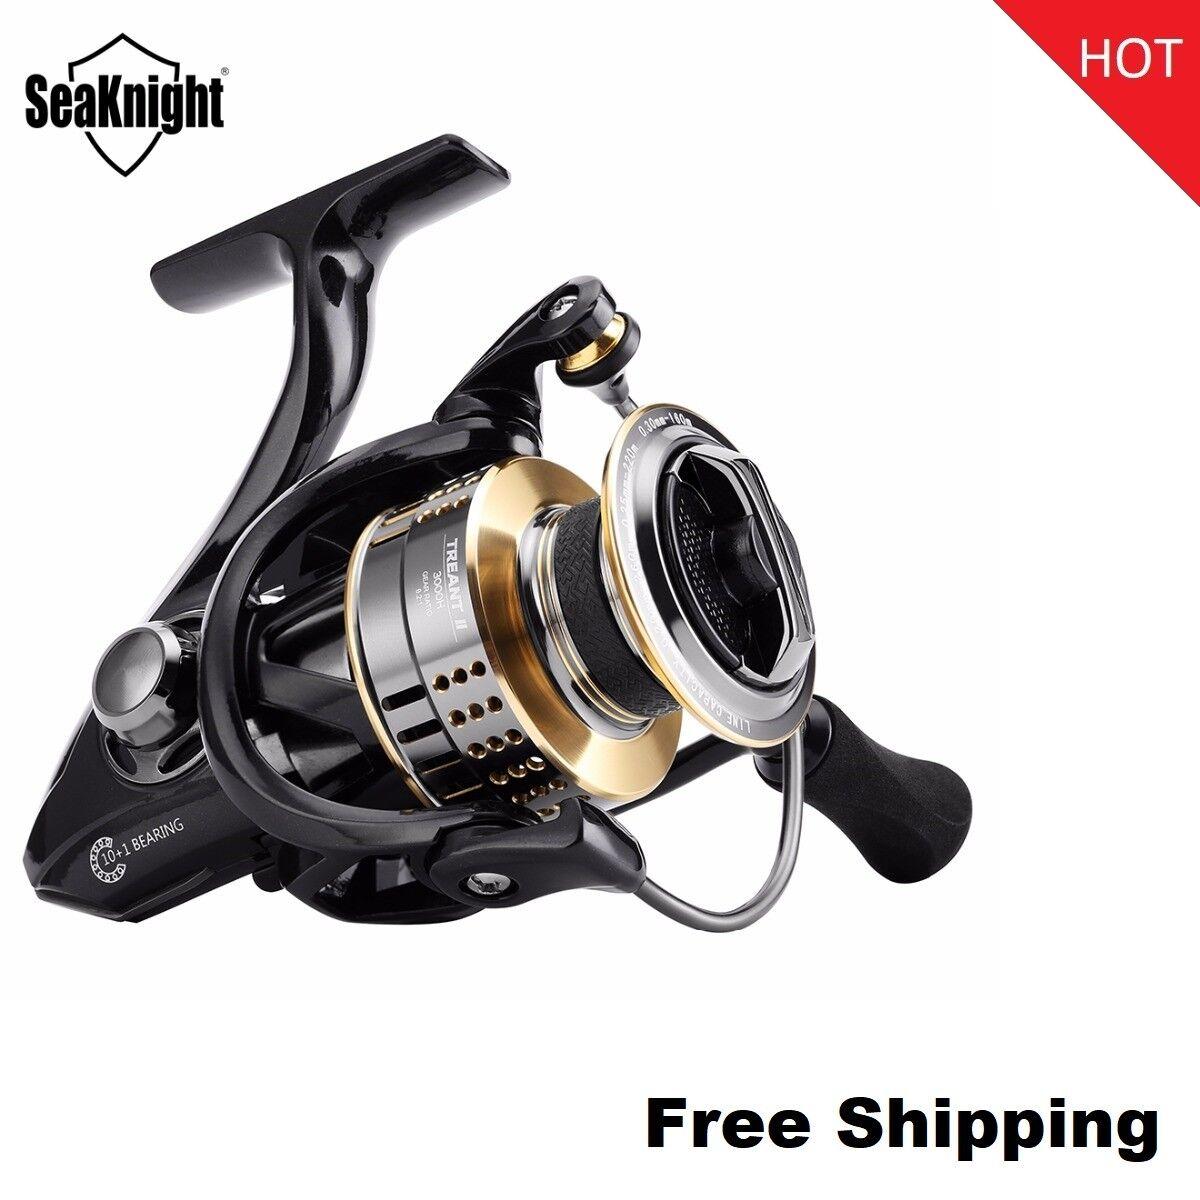 SeaKnight TREANT II Spinning Reel 2000H 3000H 4000H High Speed 6.2 1 Spinning